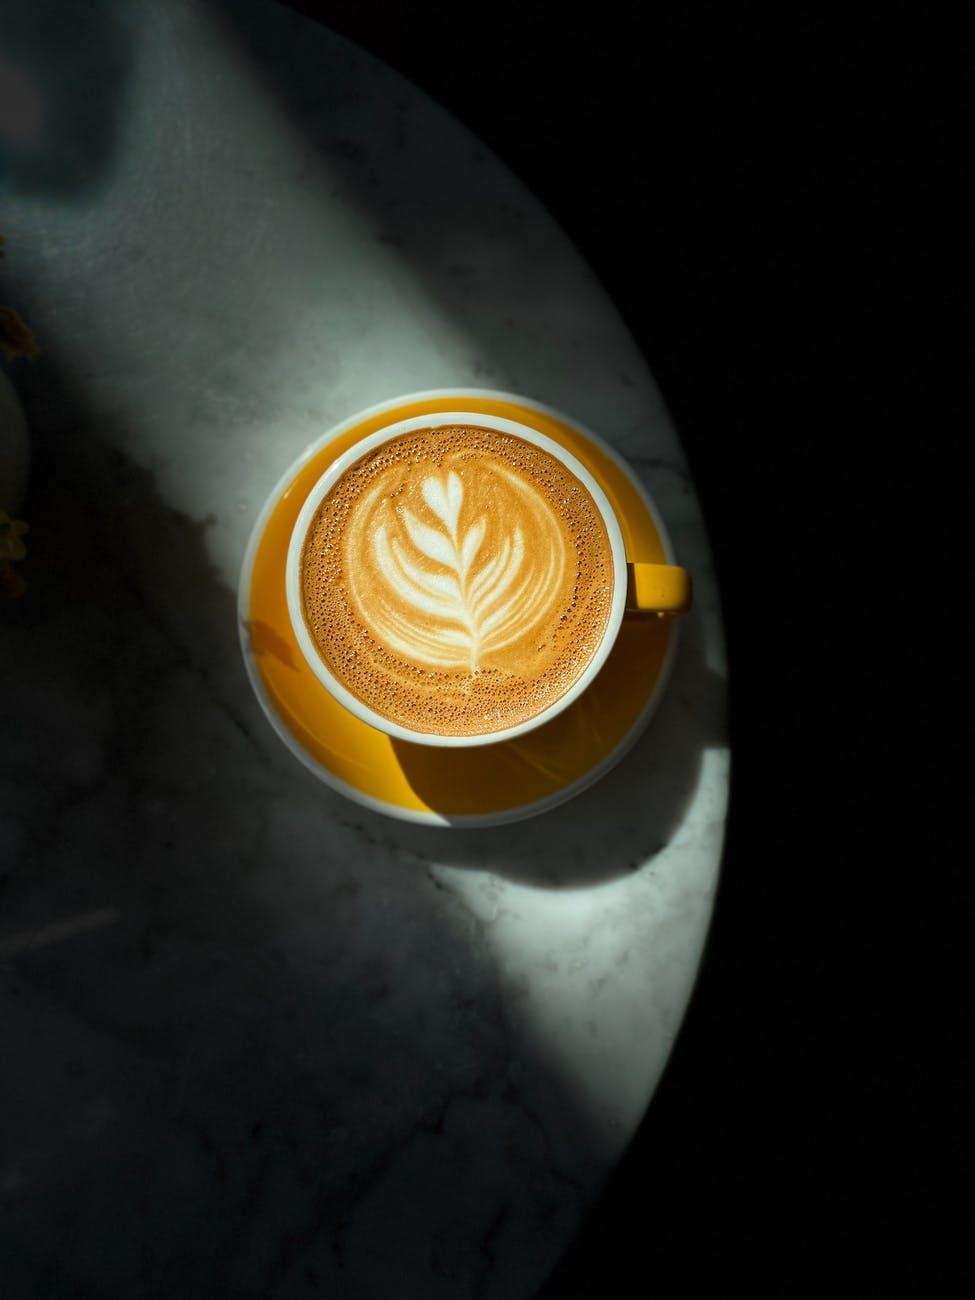 cappuccino in ceramic mug